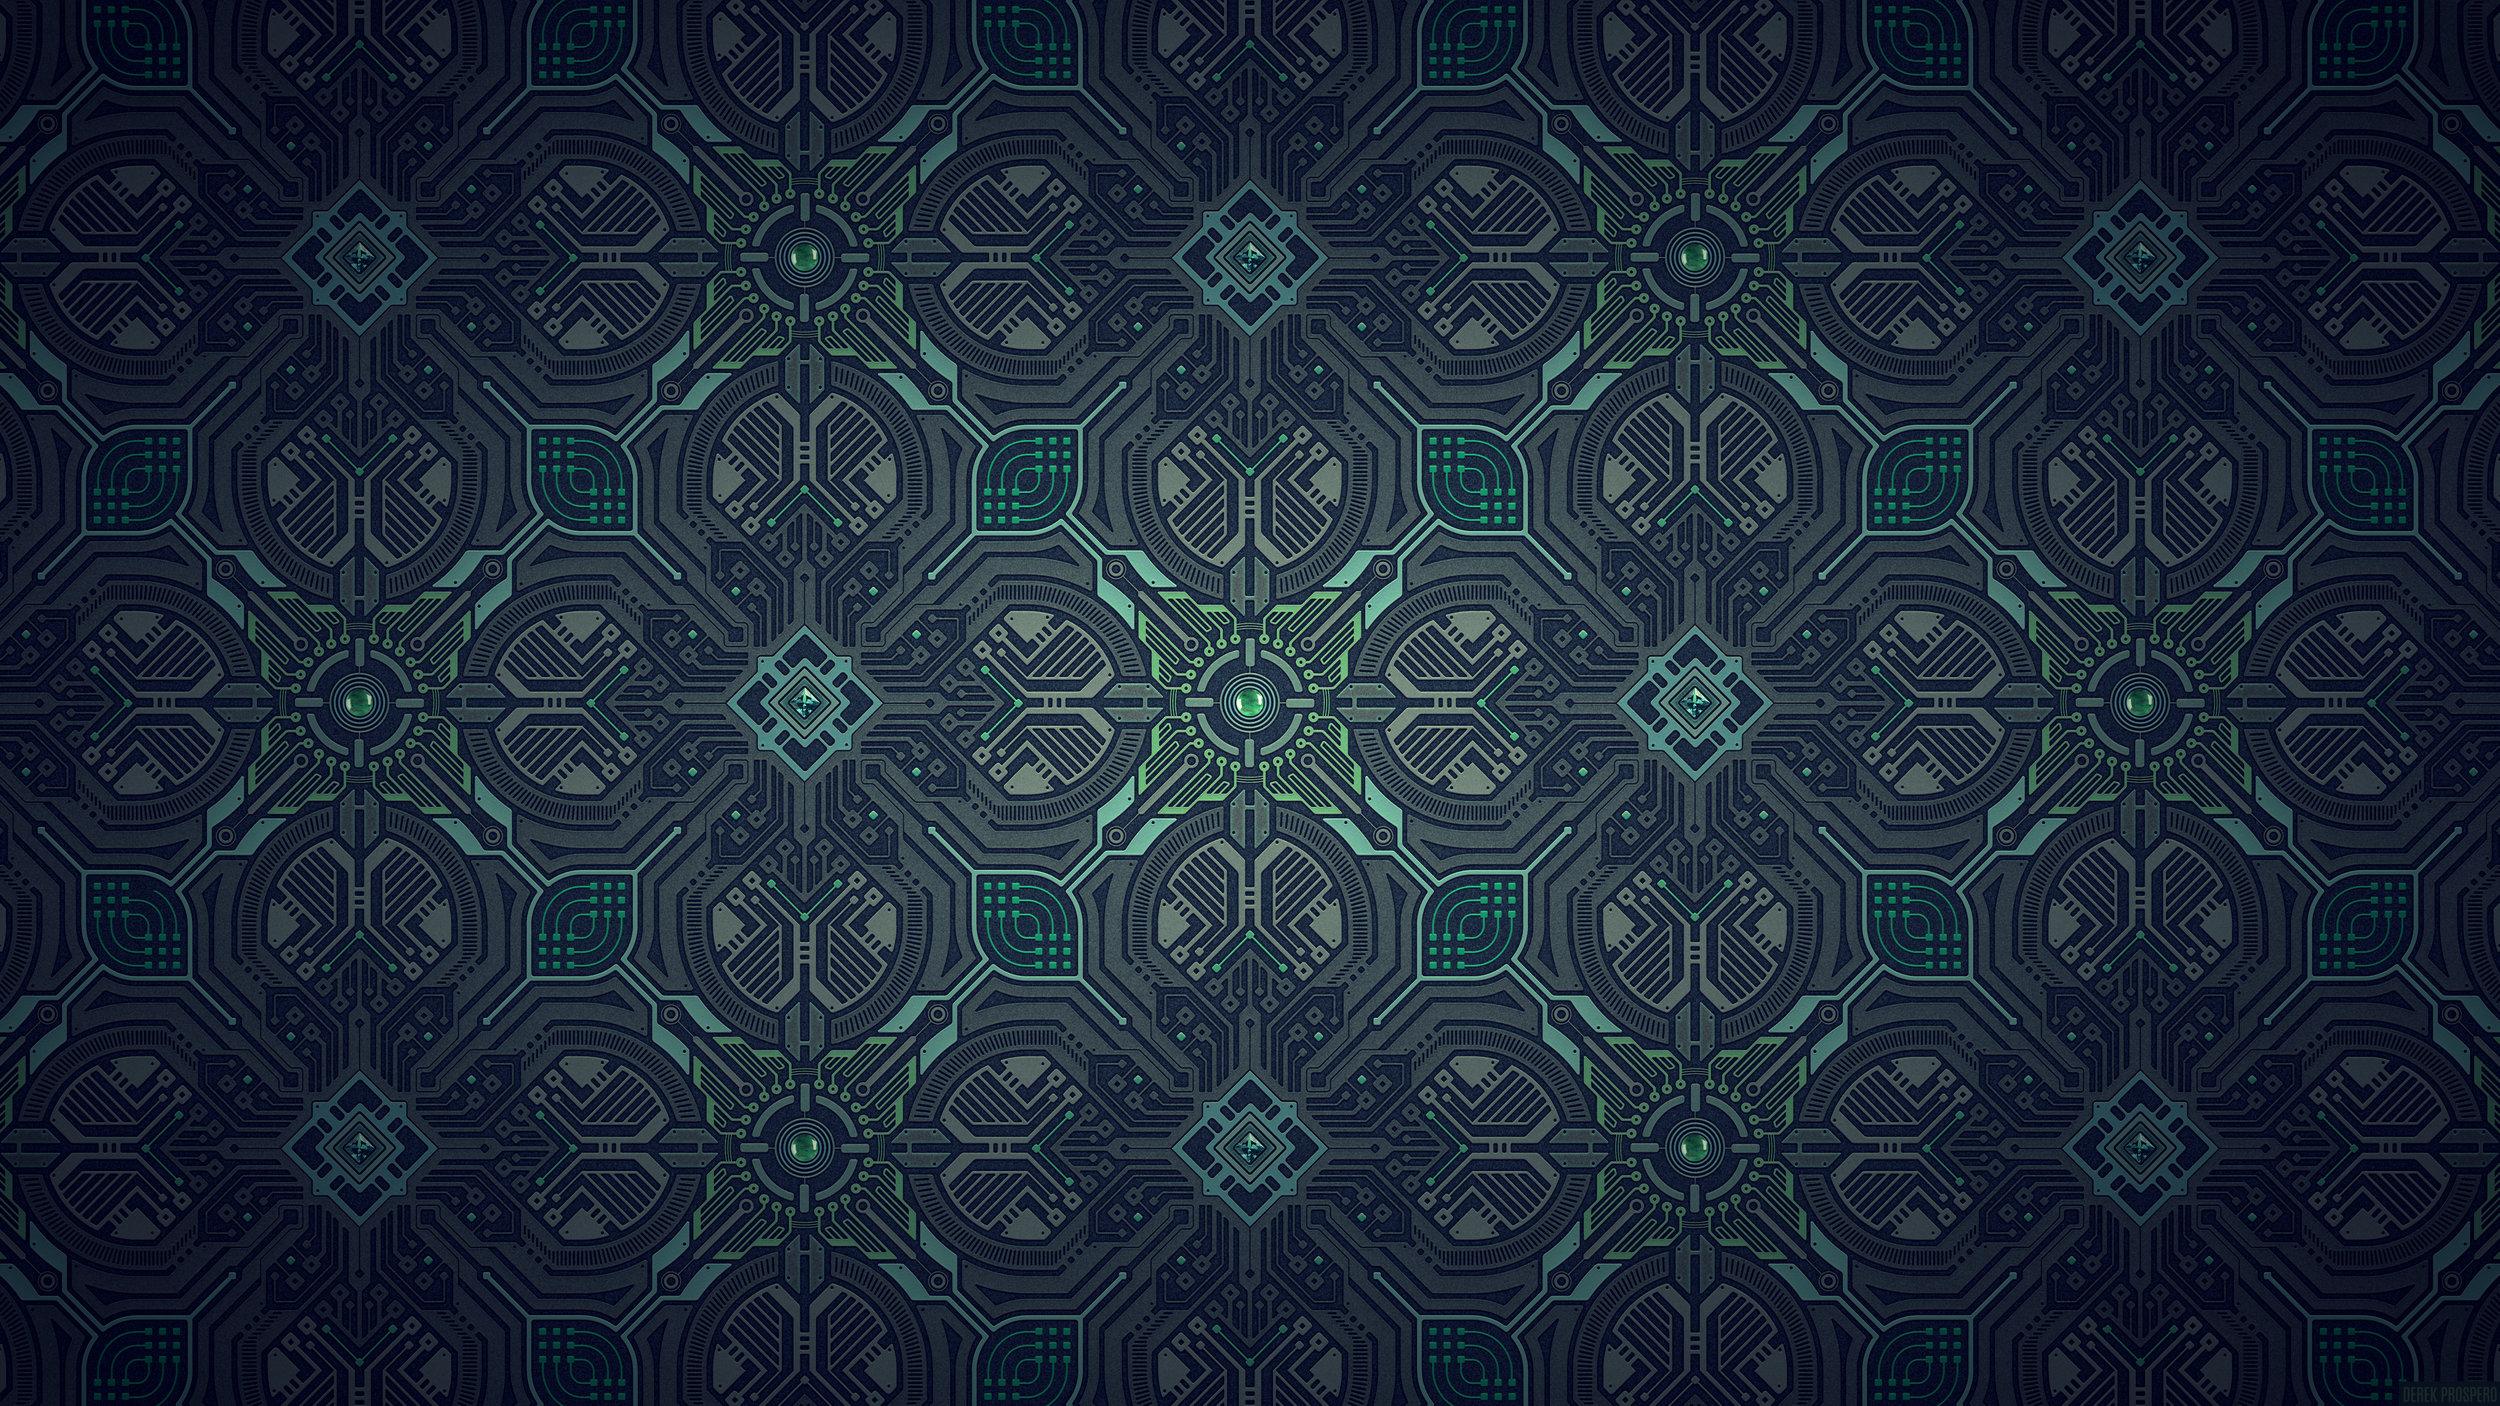 pattern-004.jpg